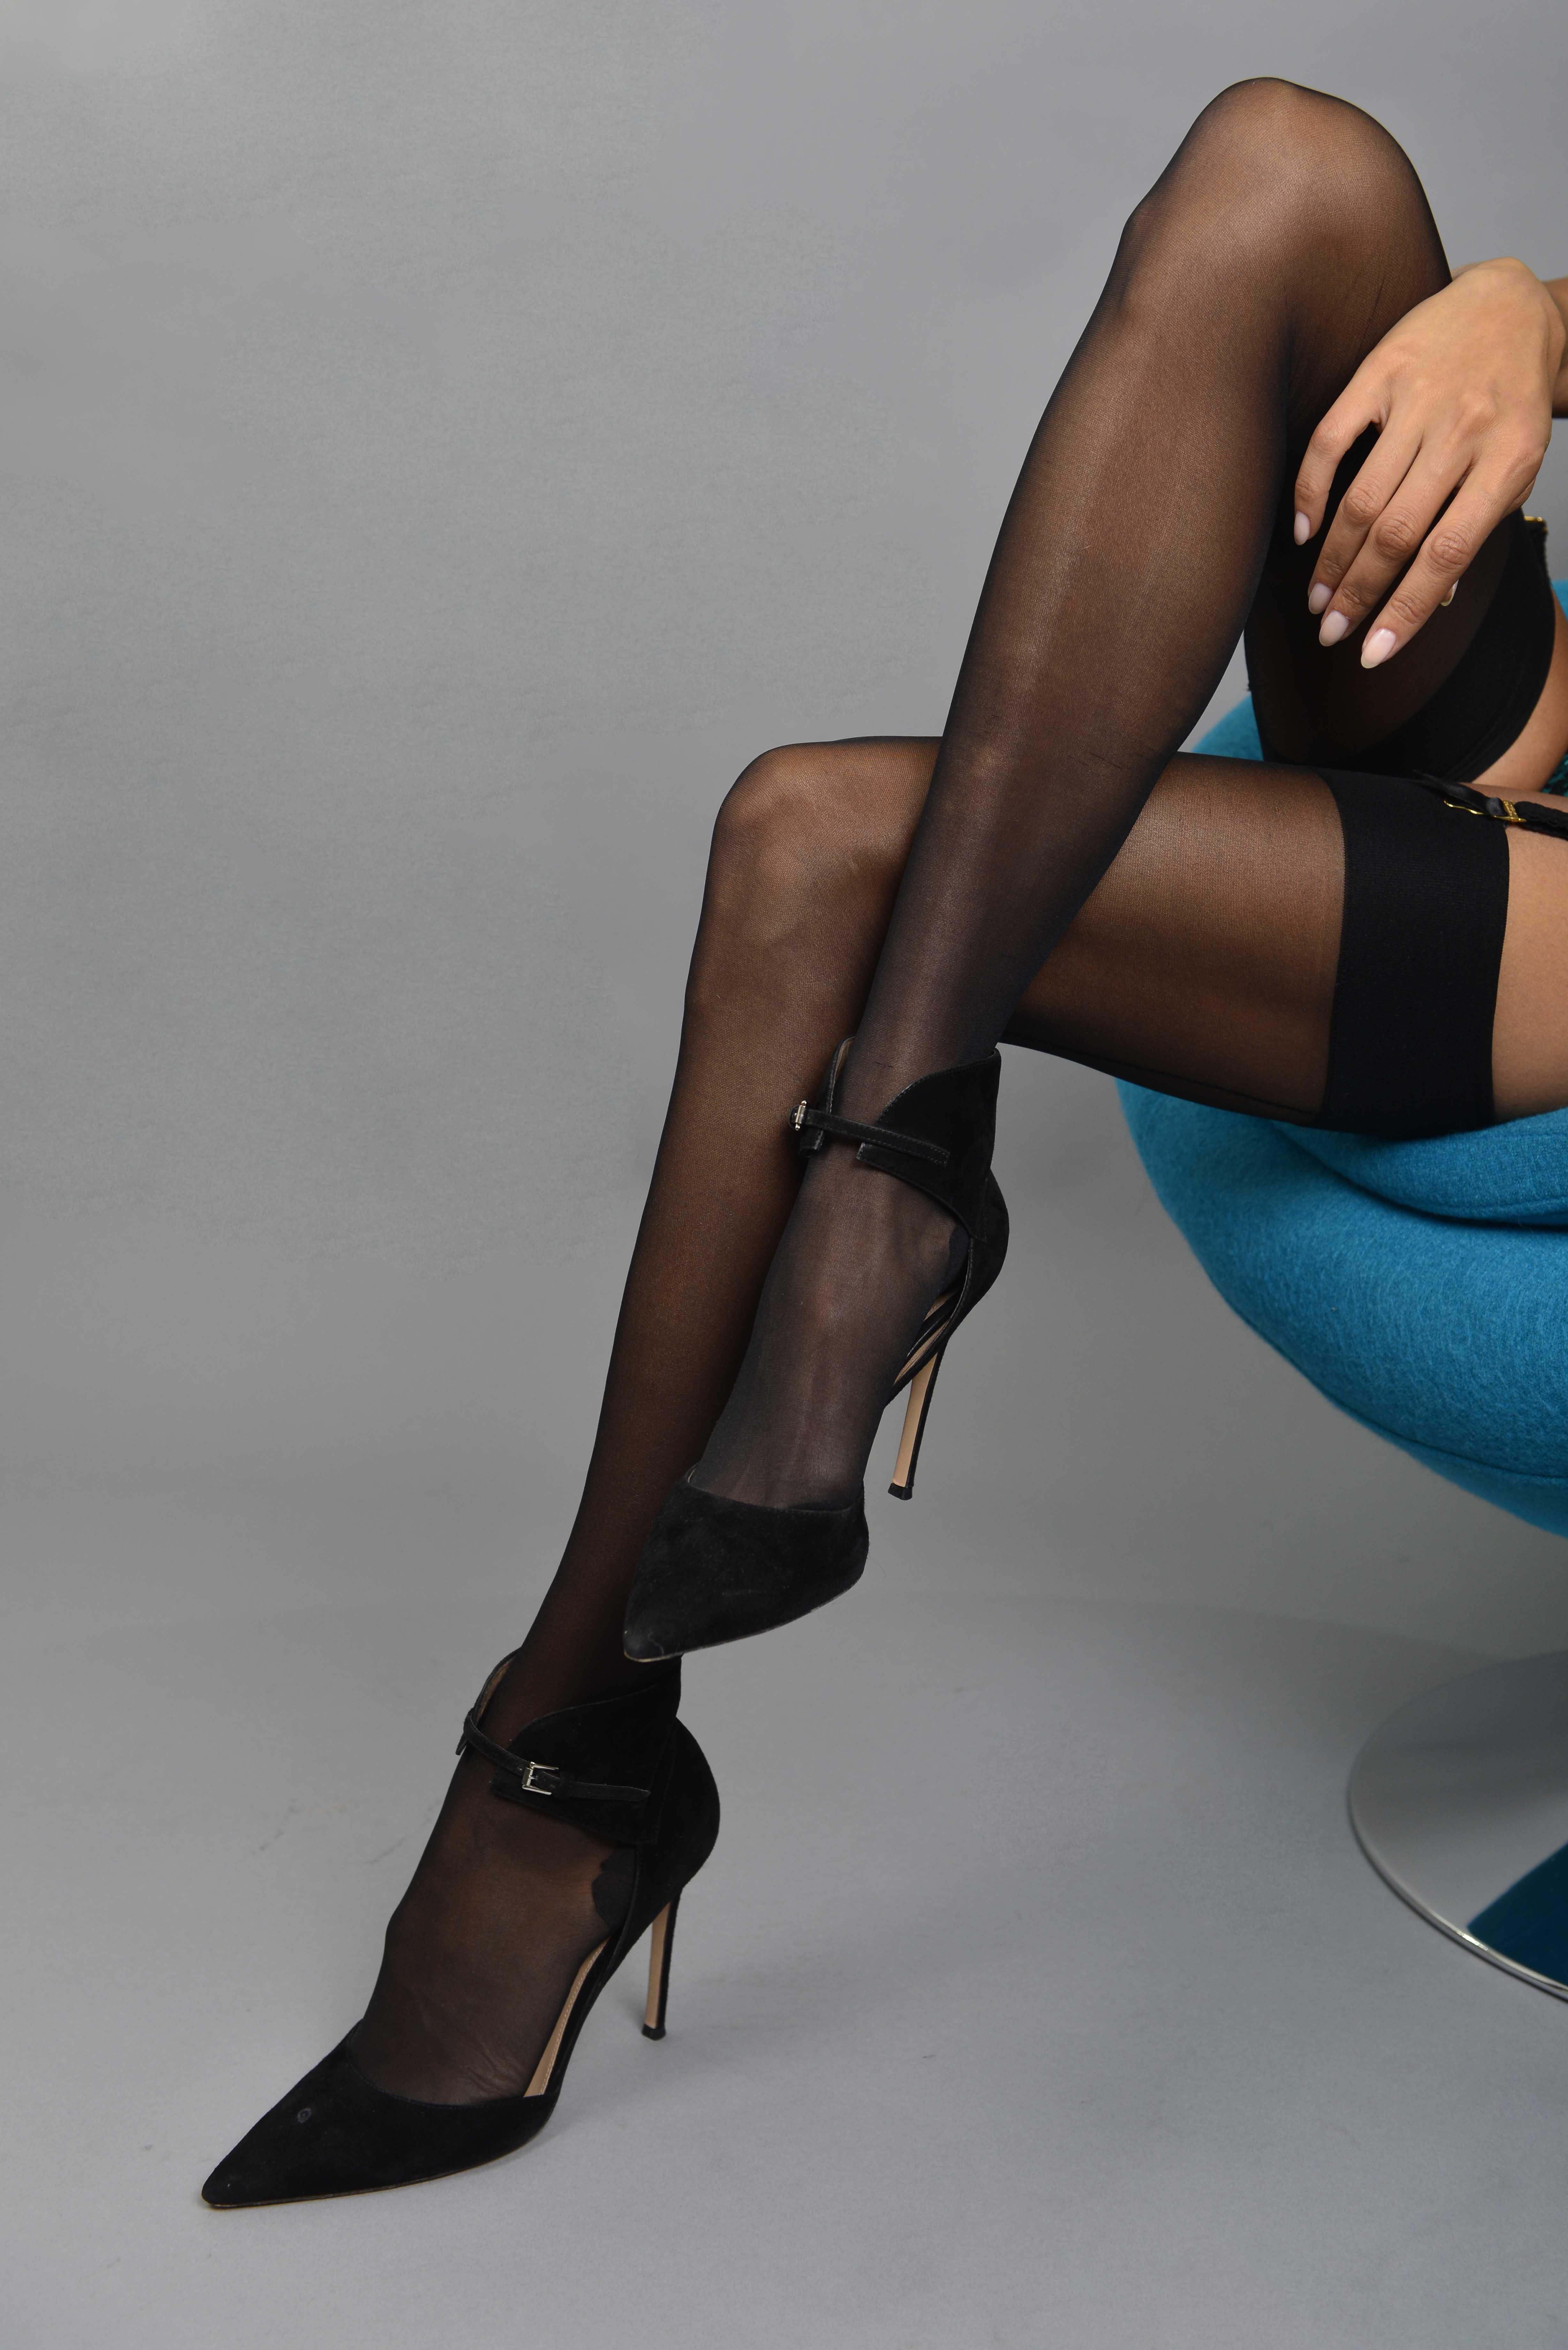 tehmina-sunny_legs2